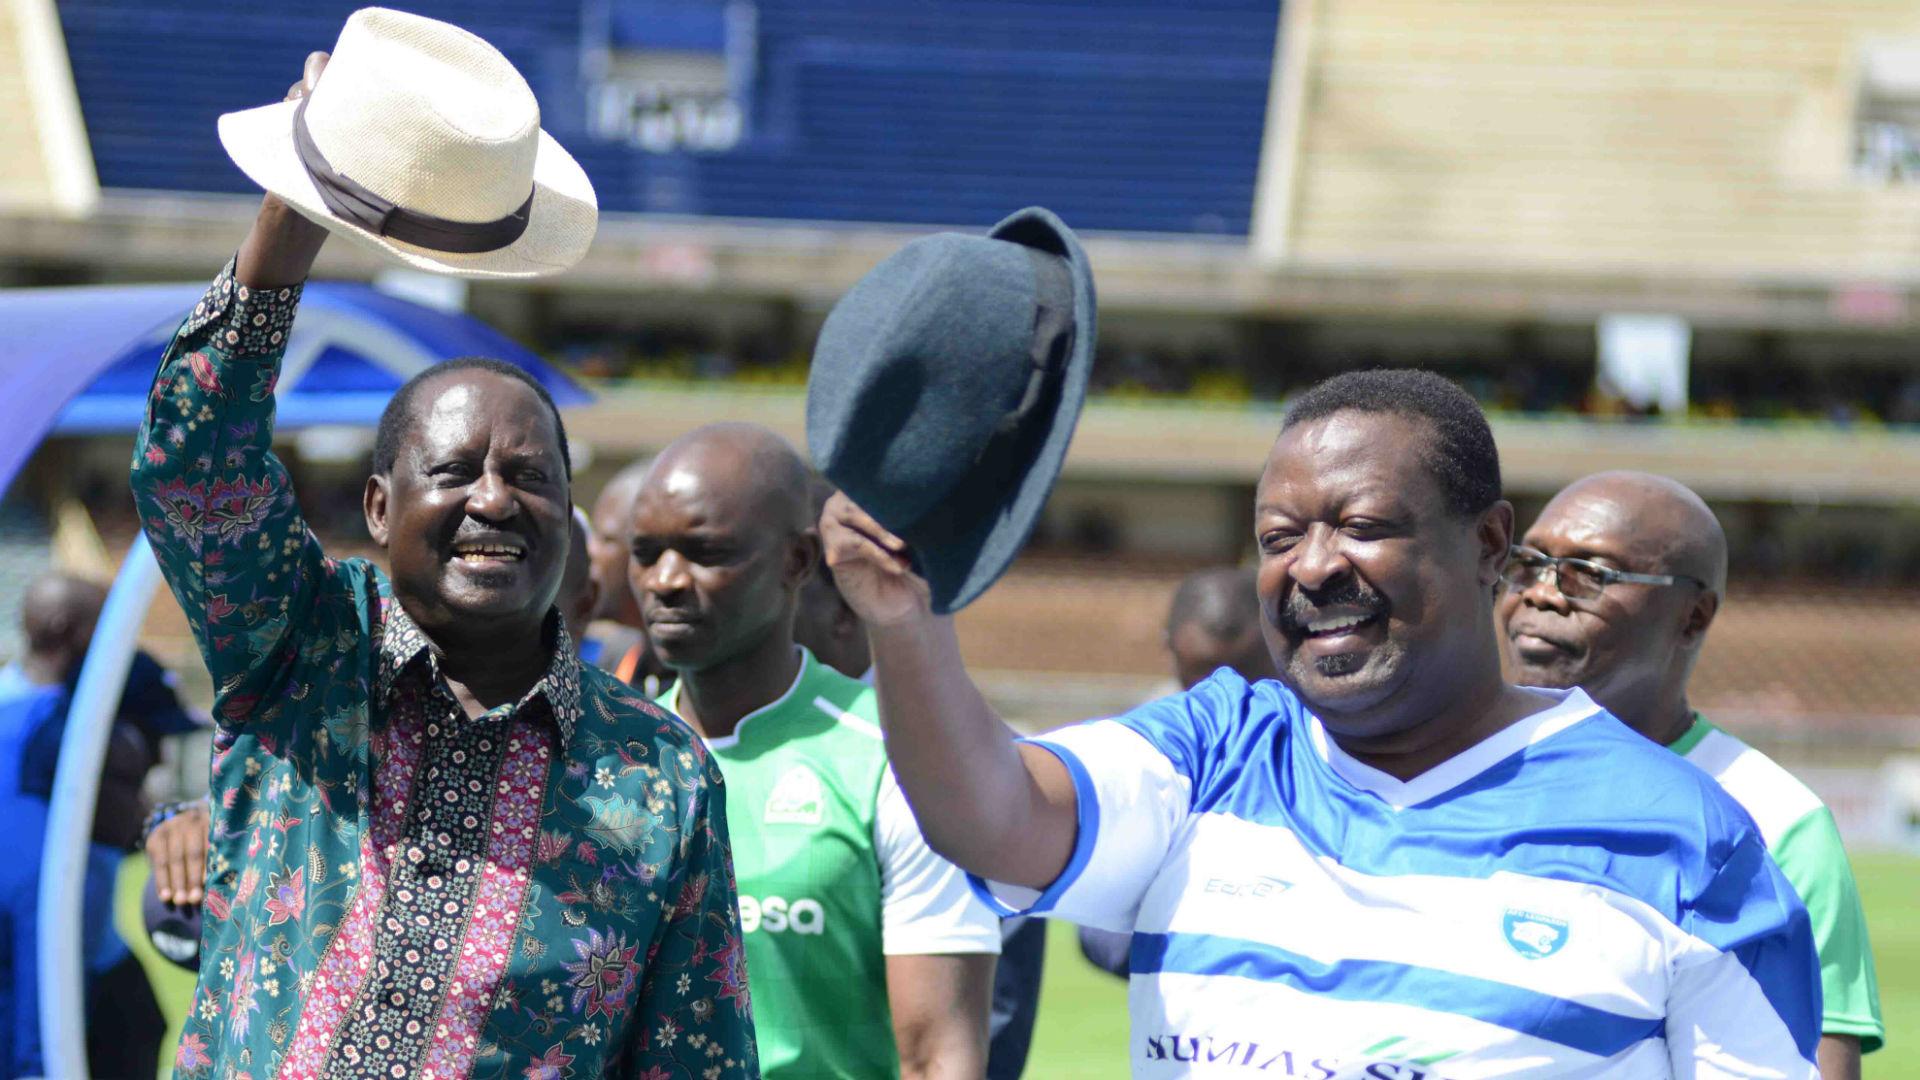 FKF presidential aspirant Mwachiro lauds Mudavadi's financial boost for AFC Leopards